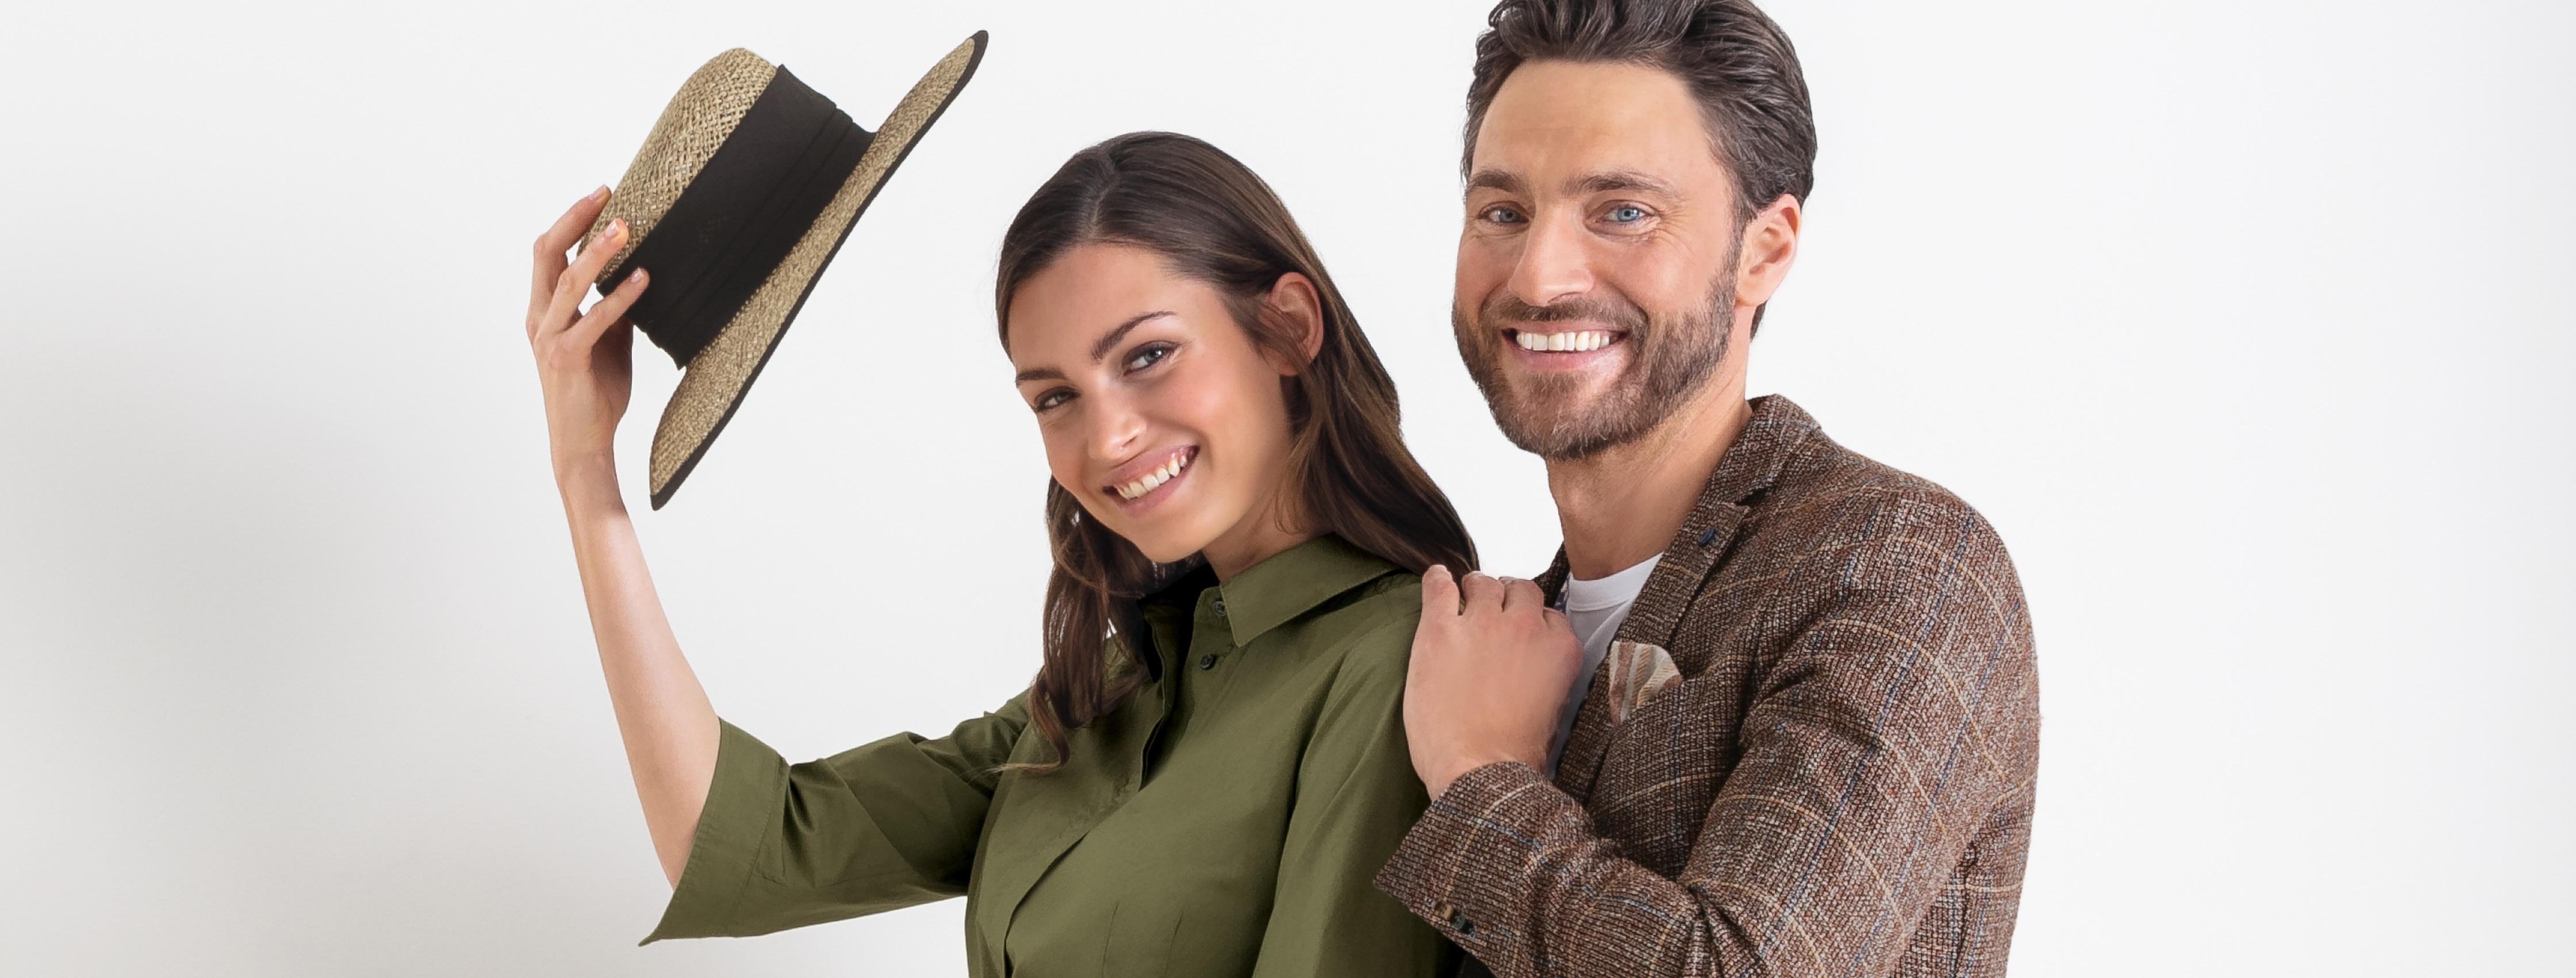 personal shopping terminvereinbarung | wöhrl onlineshop